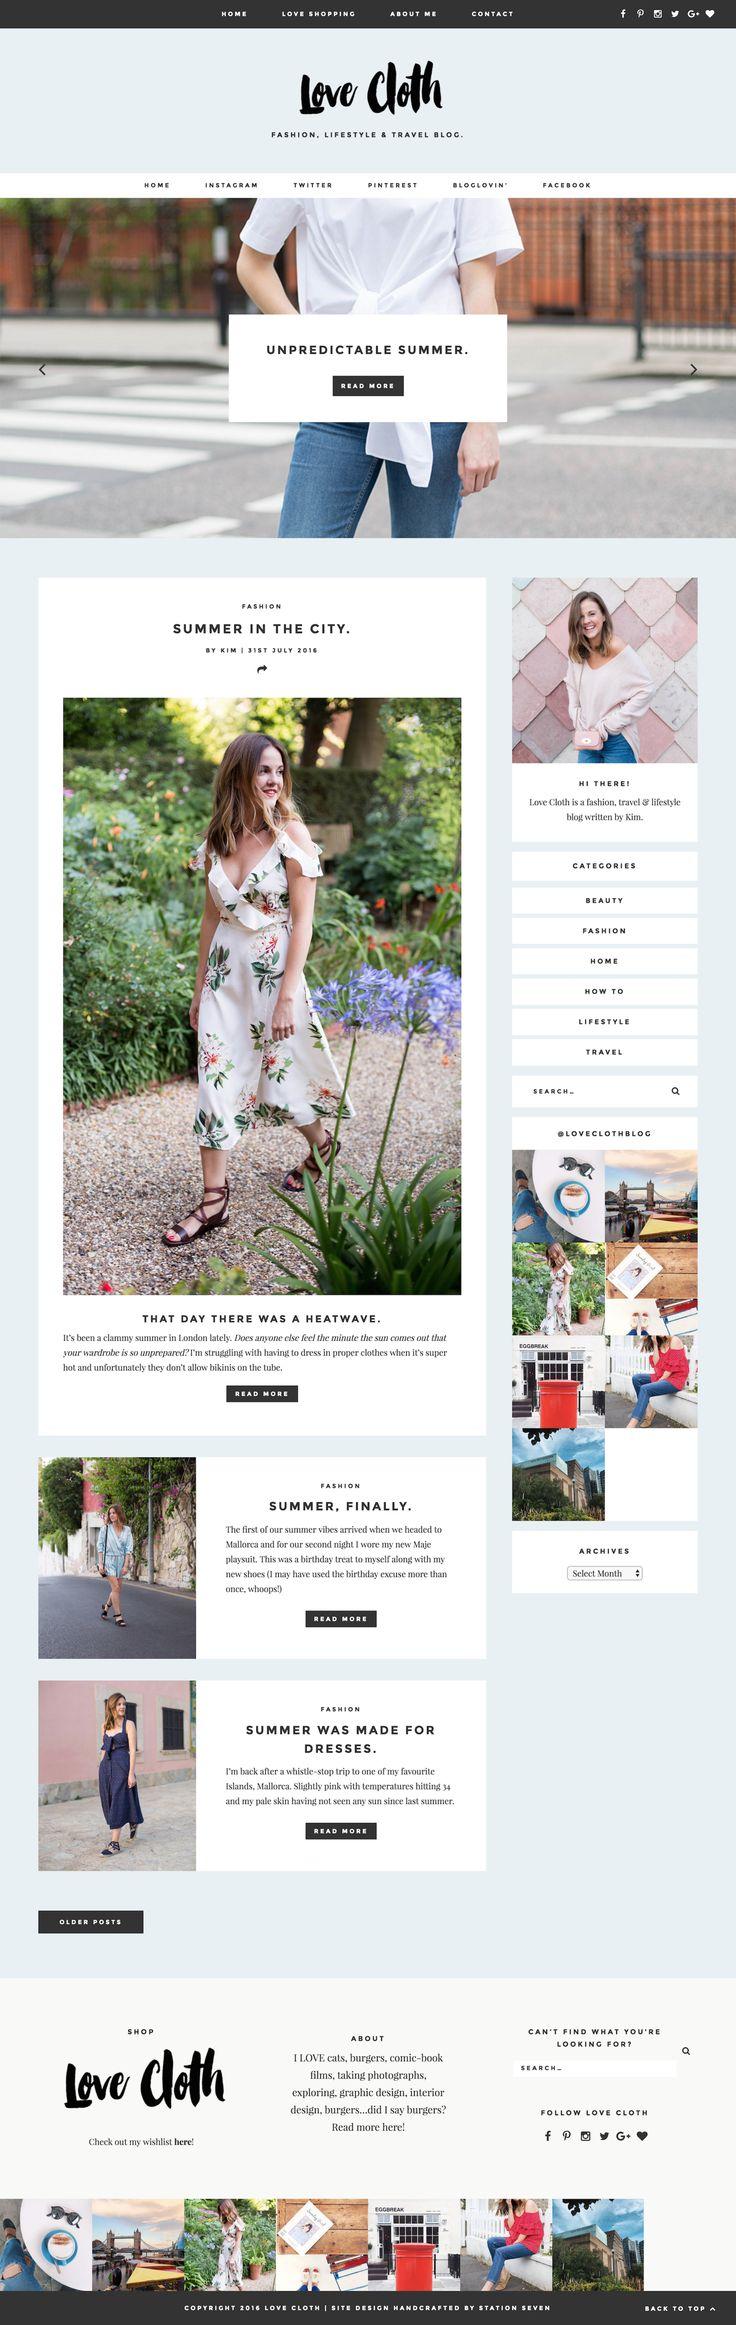 Love Cloth's beautiful fashion and lifestyle blog running on Station Seven's Monstera WordPress theme.